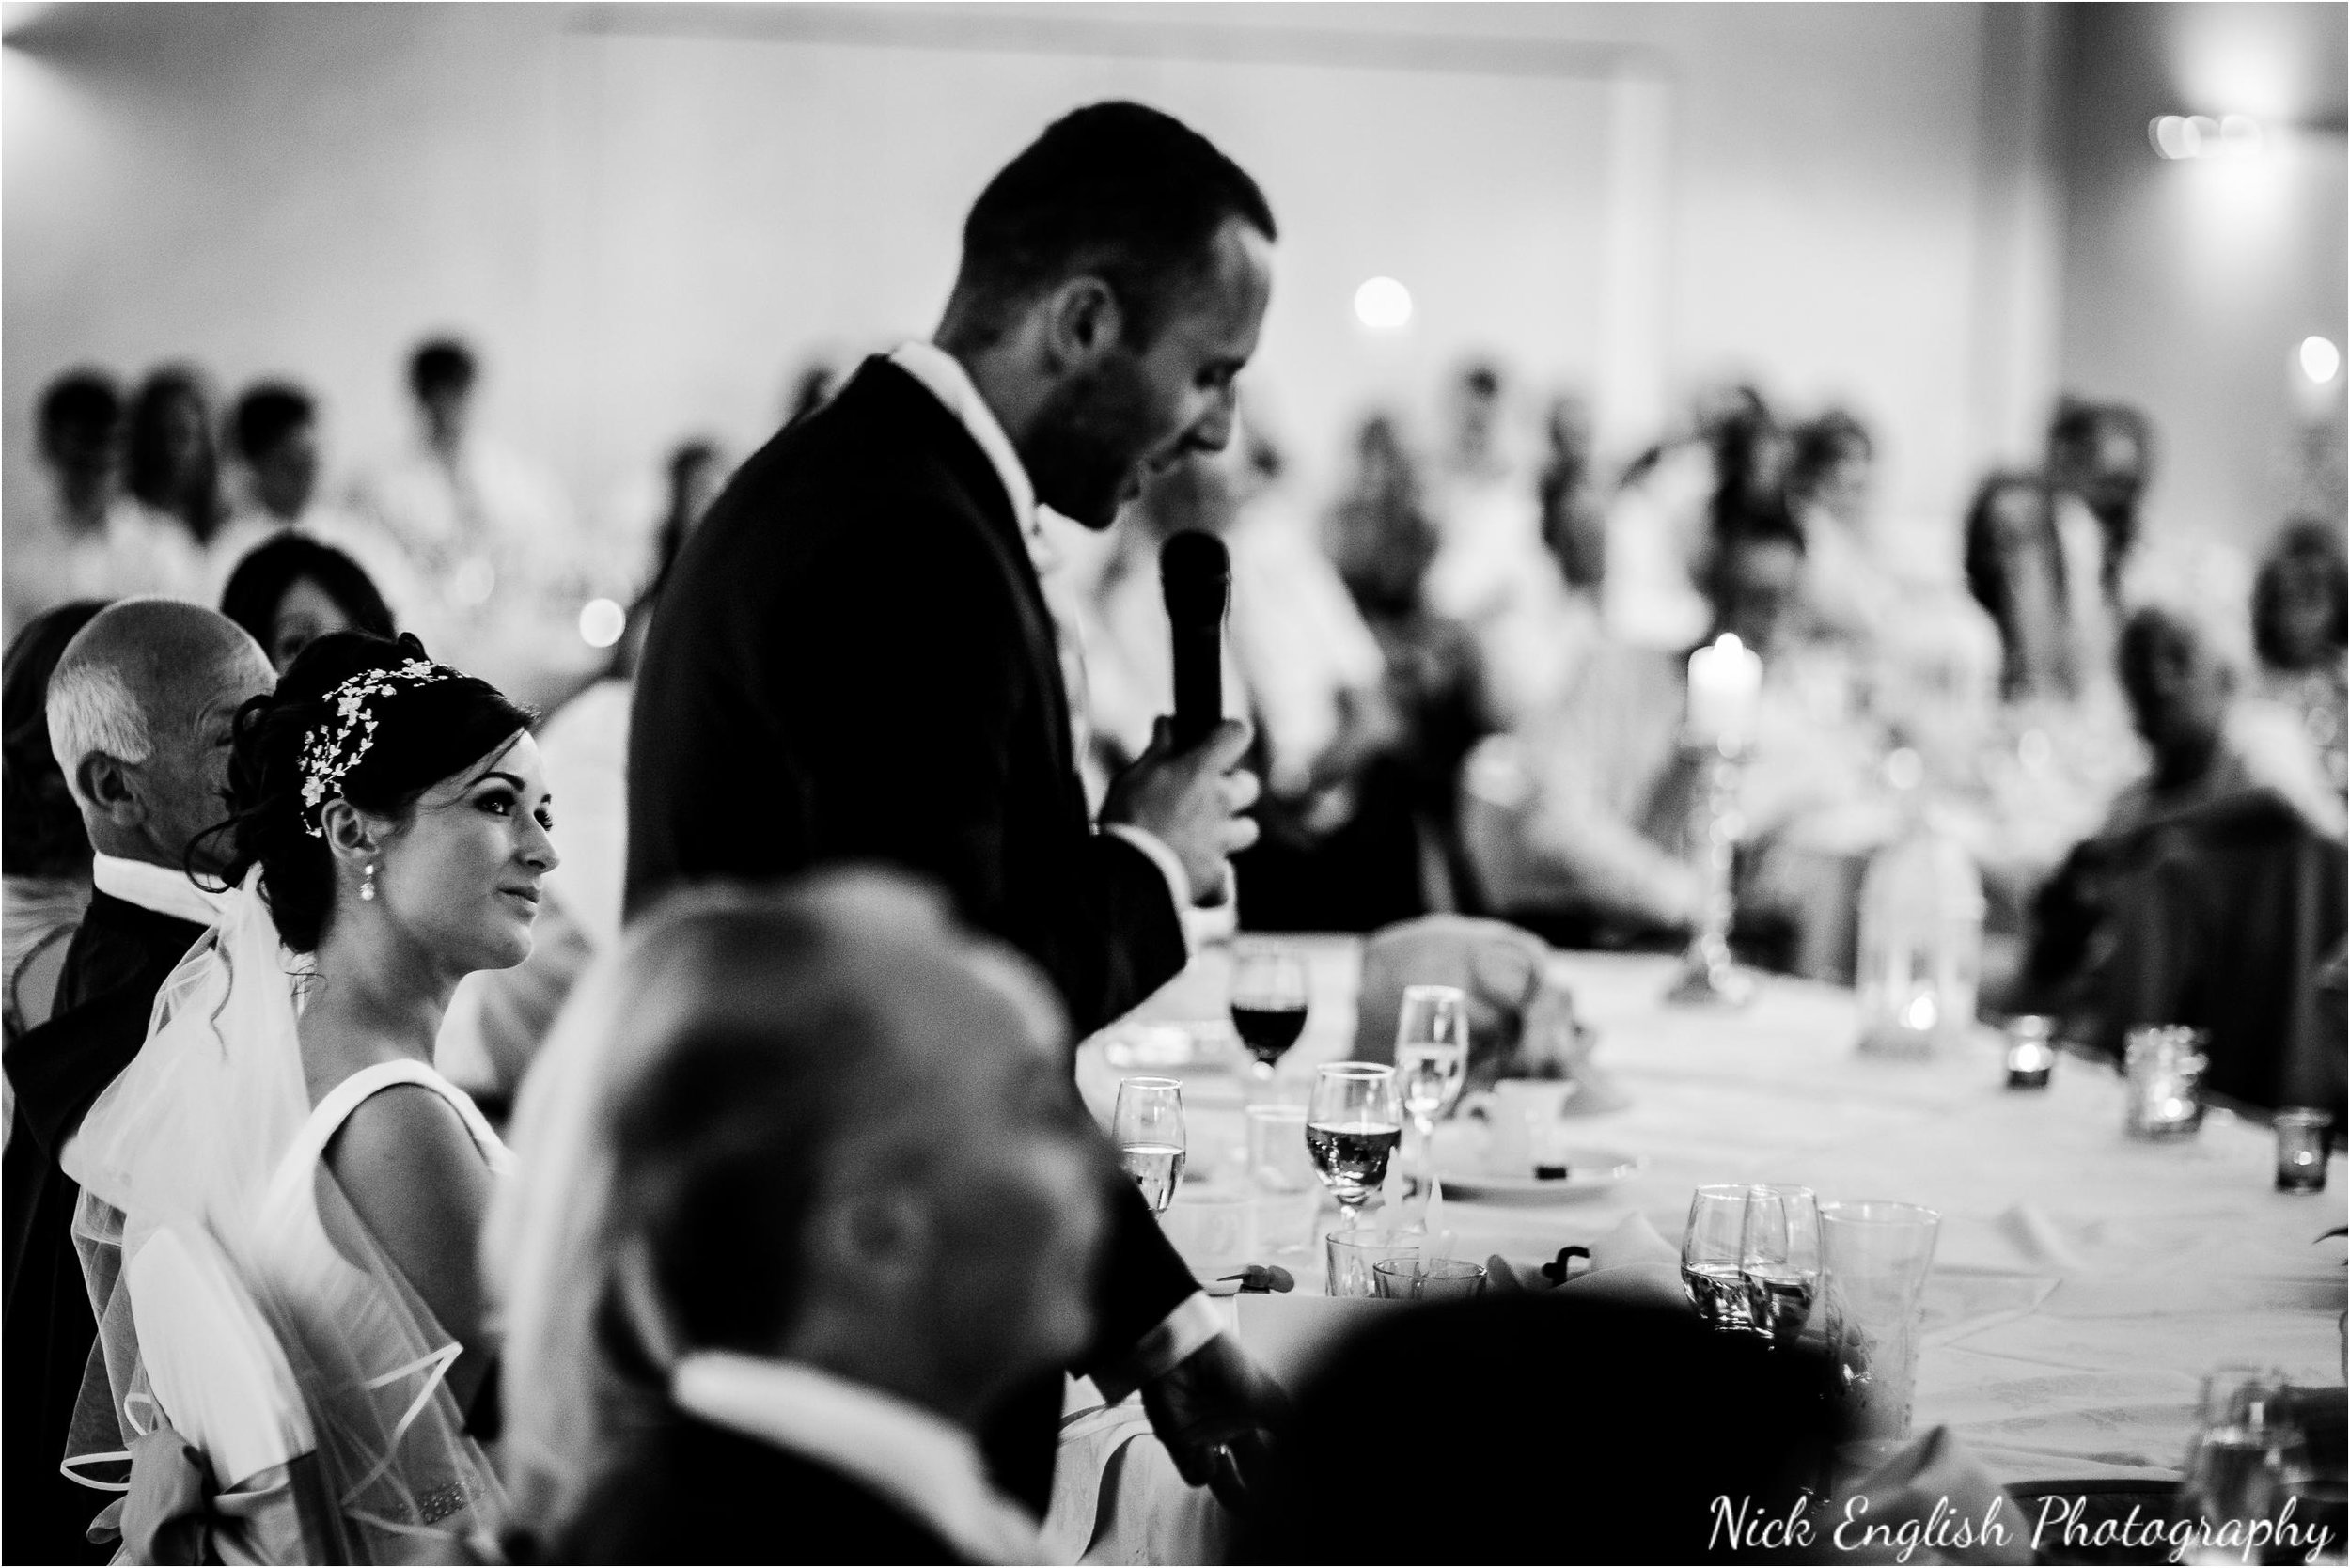 Emily David Wedding Photographs at Barton Grange Preston by Nick English Photography 174jpg.jpeg